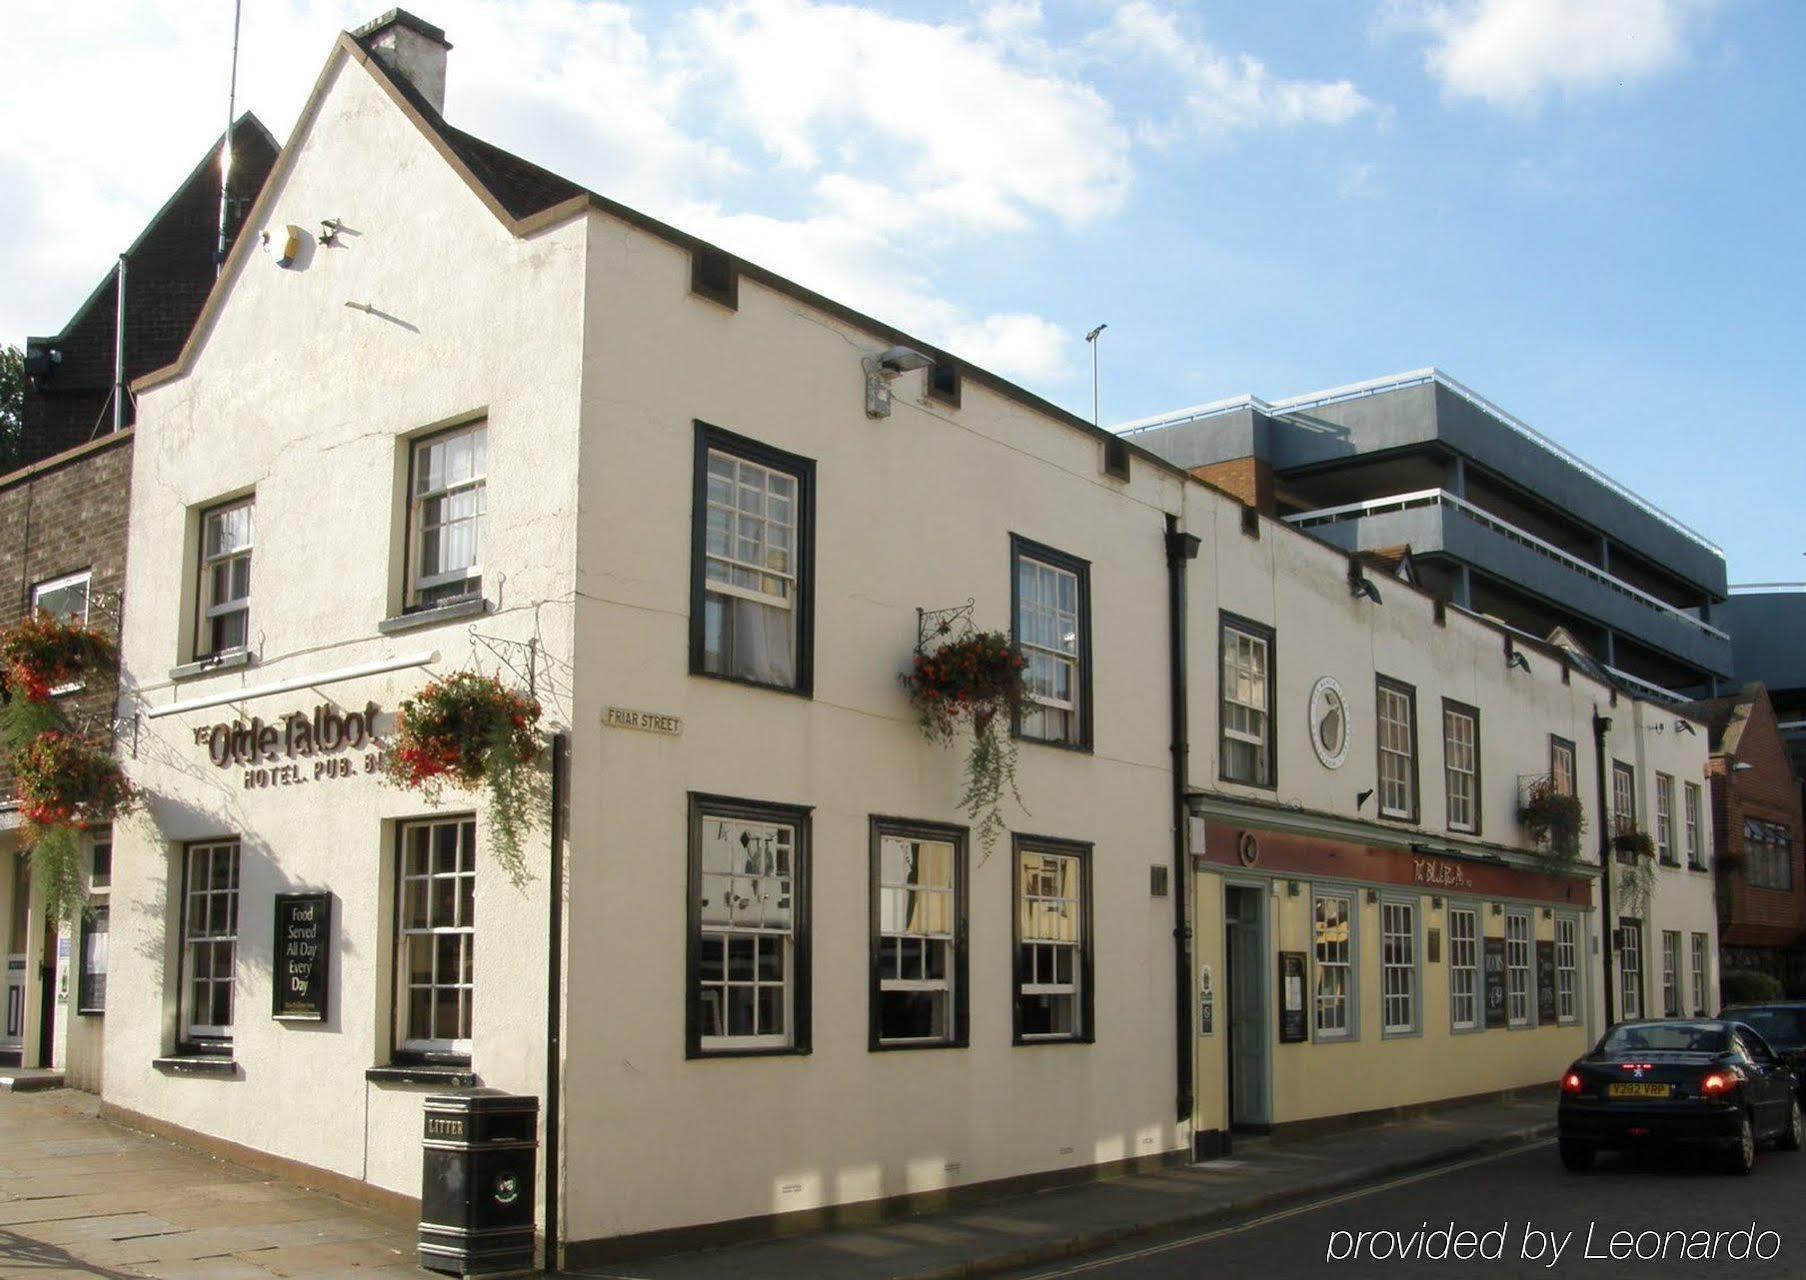 Ye Olde Talbot Worcester by Greene King Inns